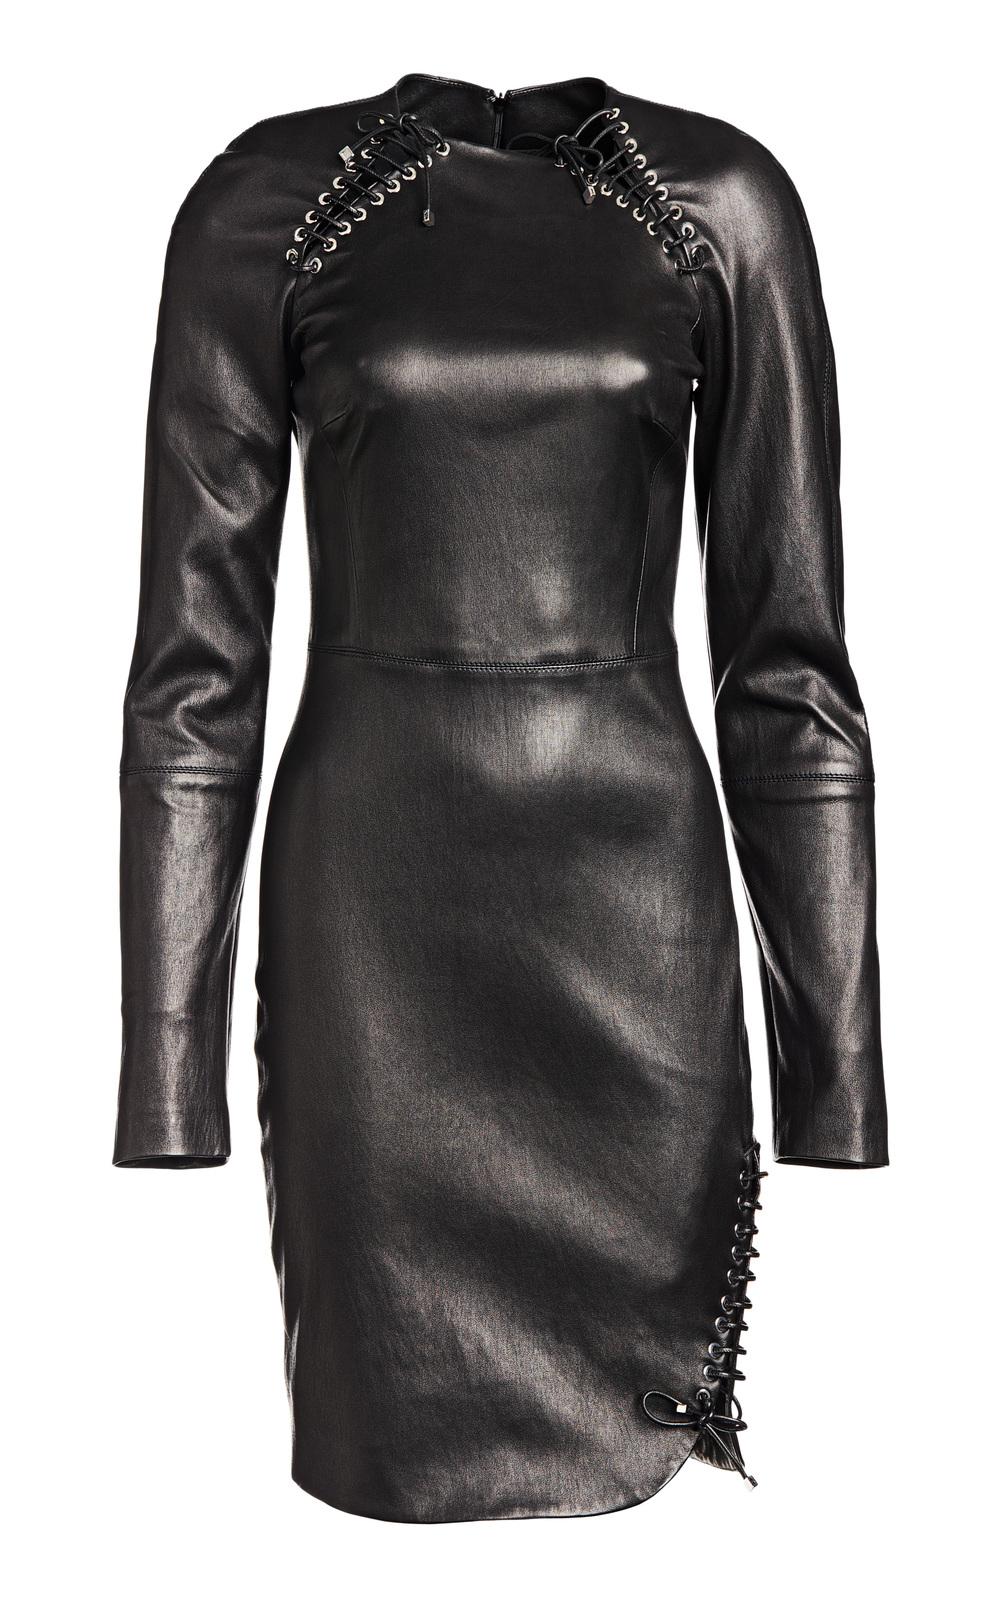 P & K Freisteller HW 2015 Emilio Pucci Kleid 2675 EUR